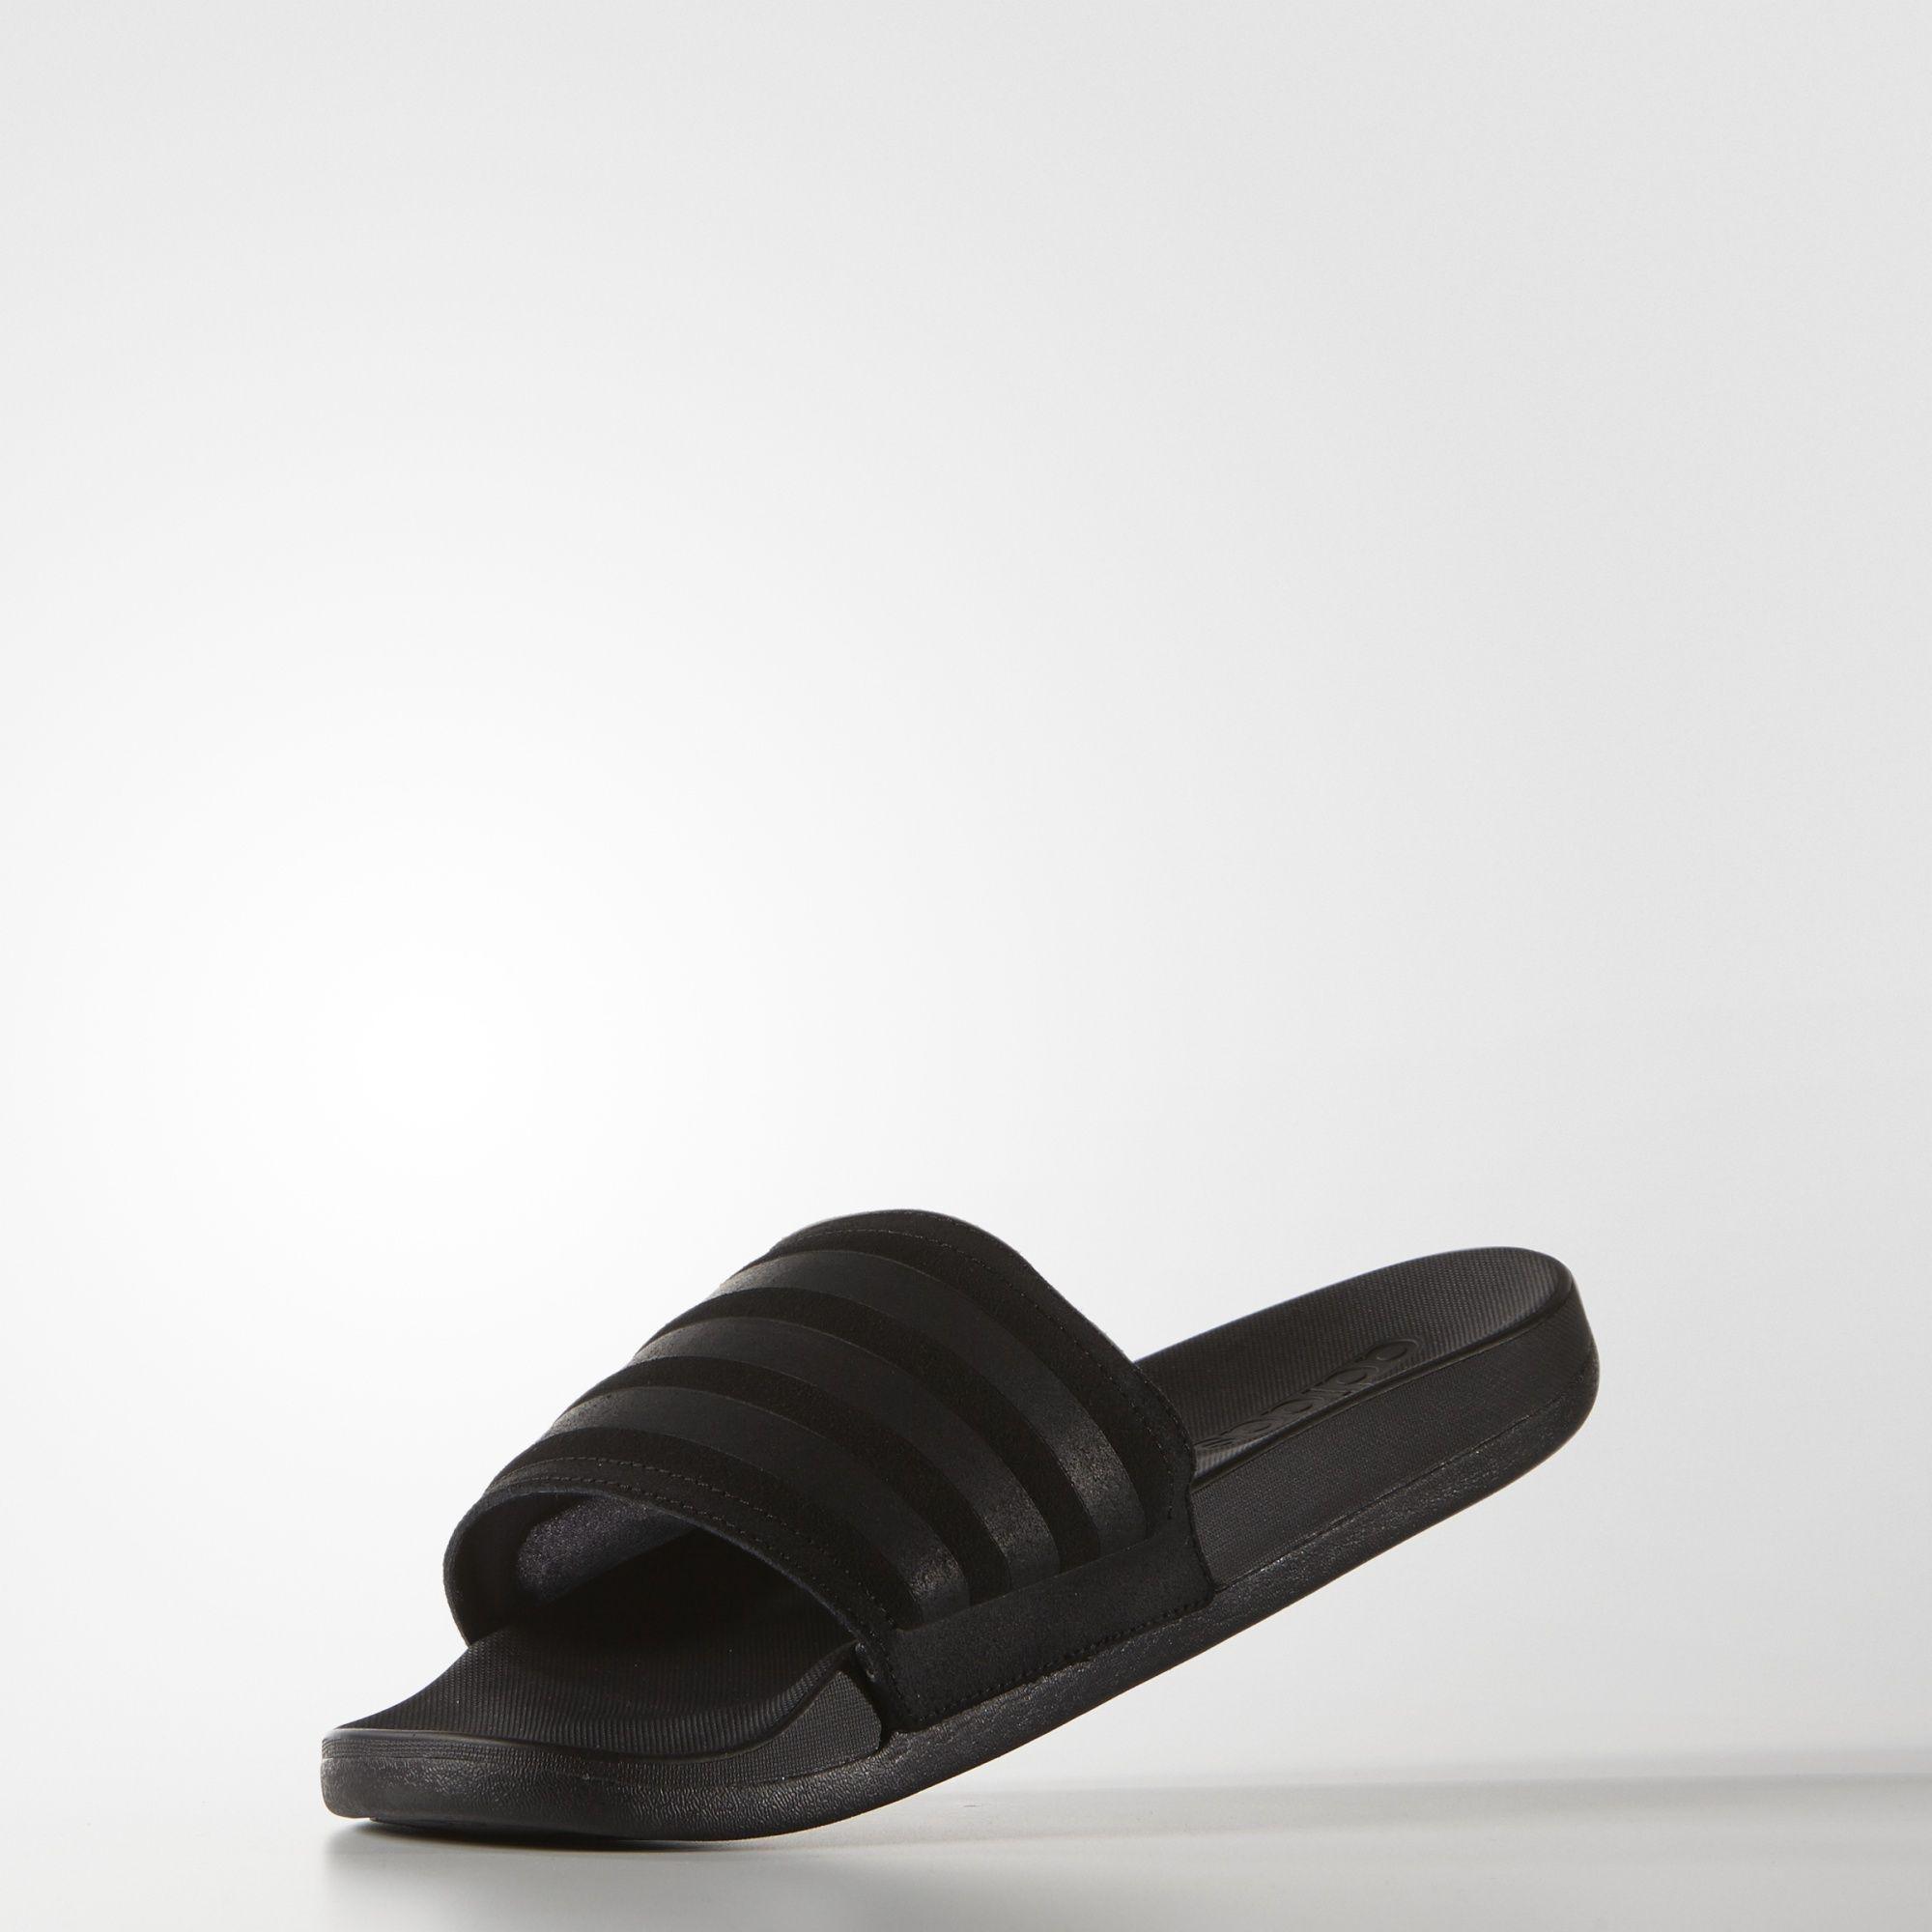 adidas adilette ultra - esploratore diapositive scarpe pinterest adidas